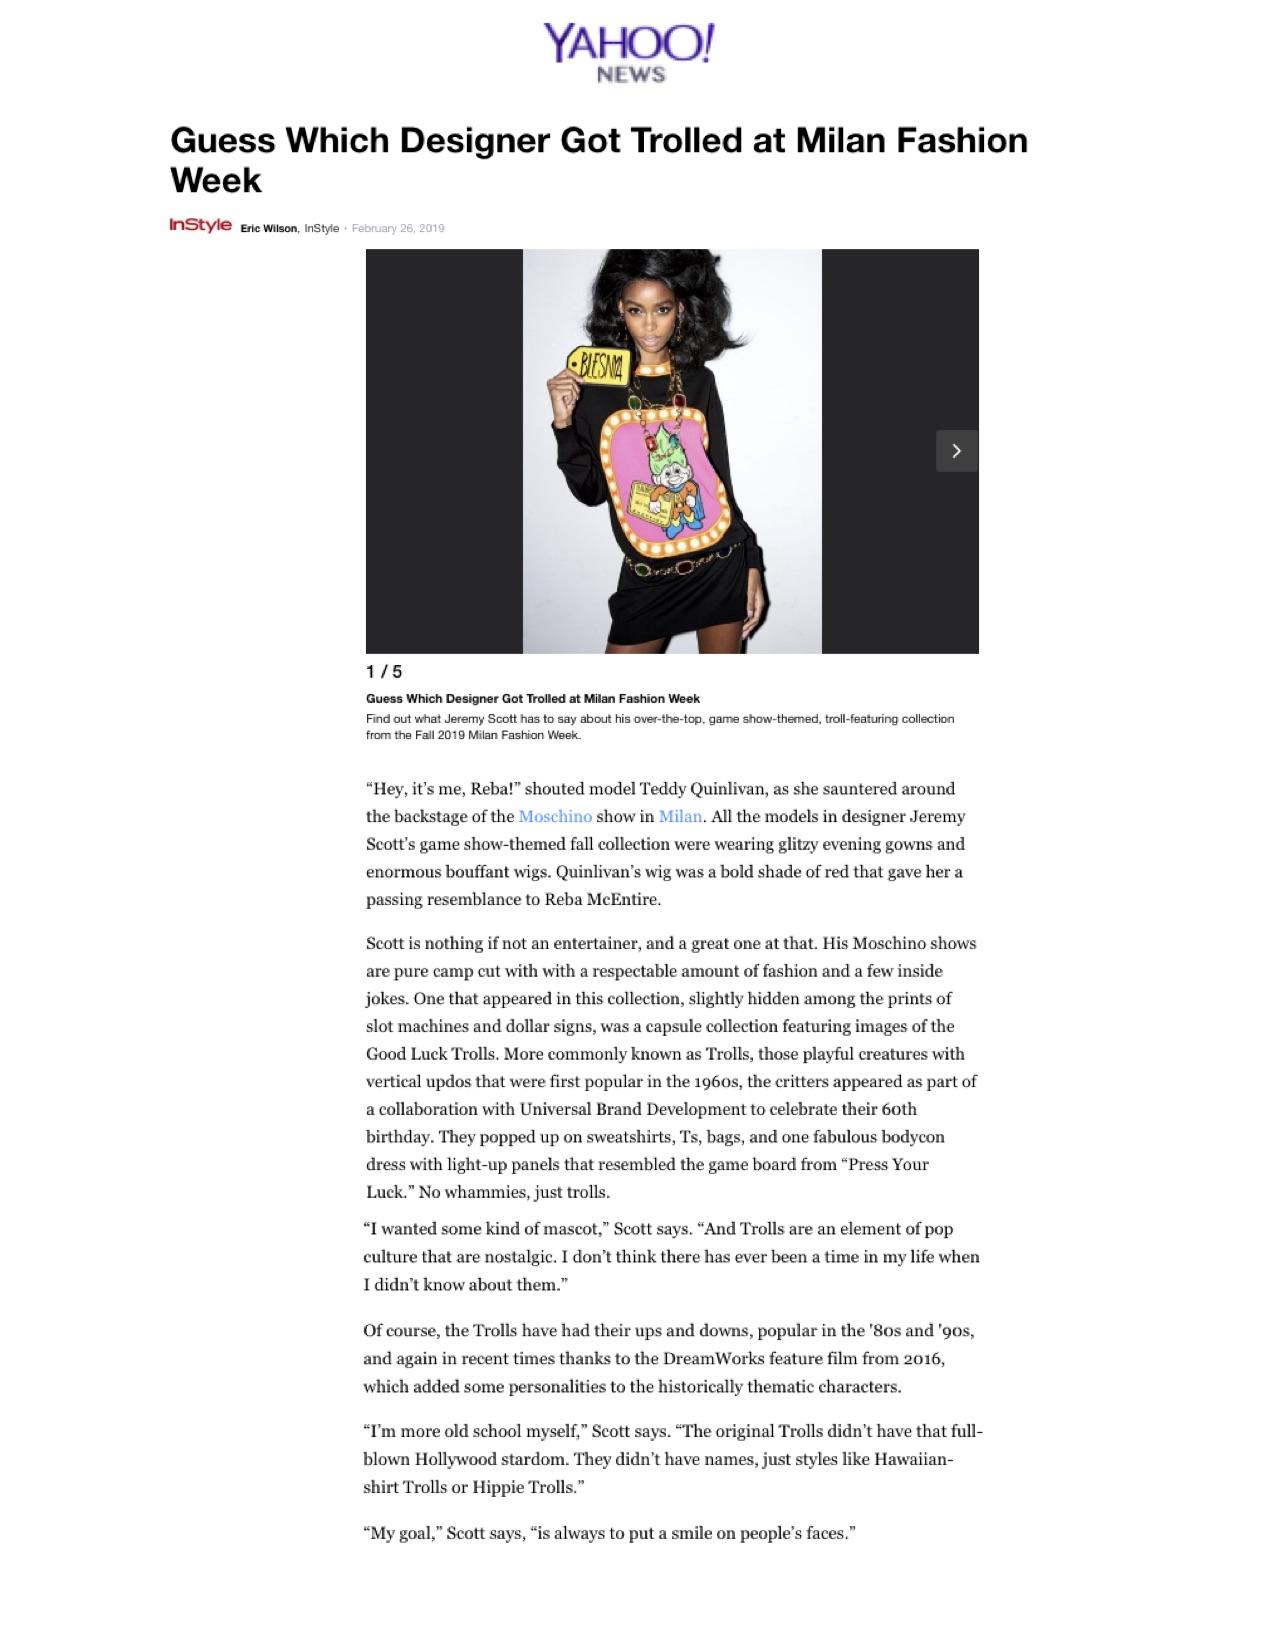 Yahoo News - Good Luck Trolls x Moschino 1.jpg